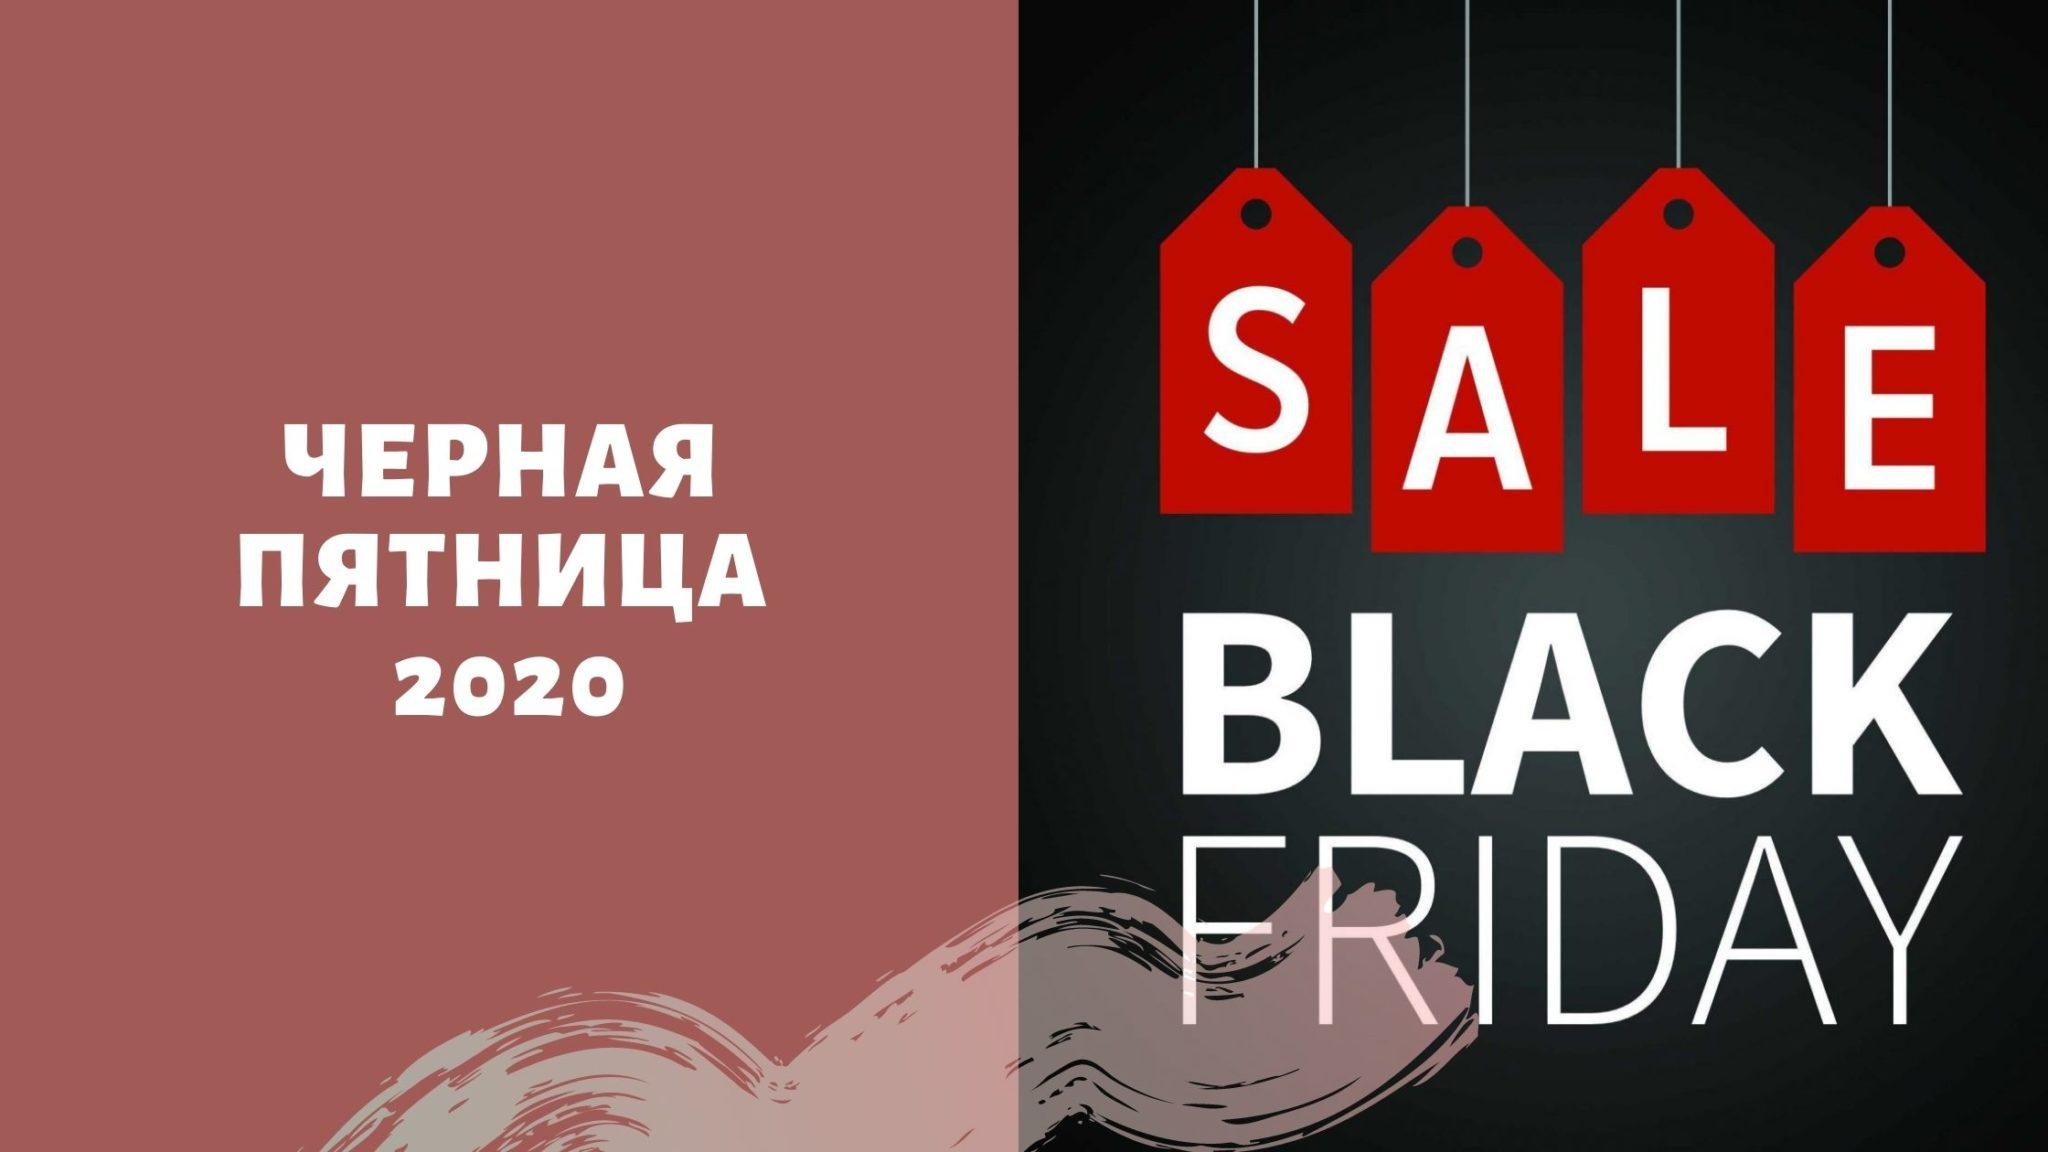 черная пятница 2020